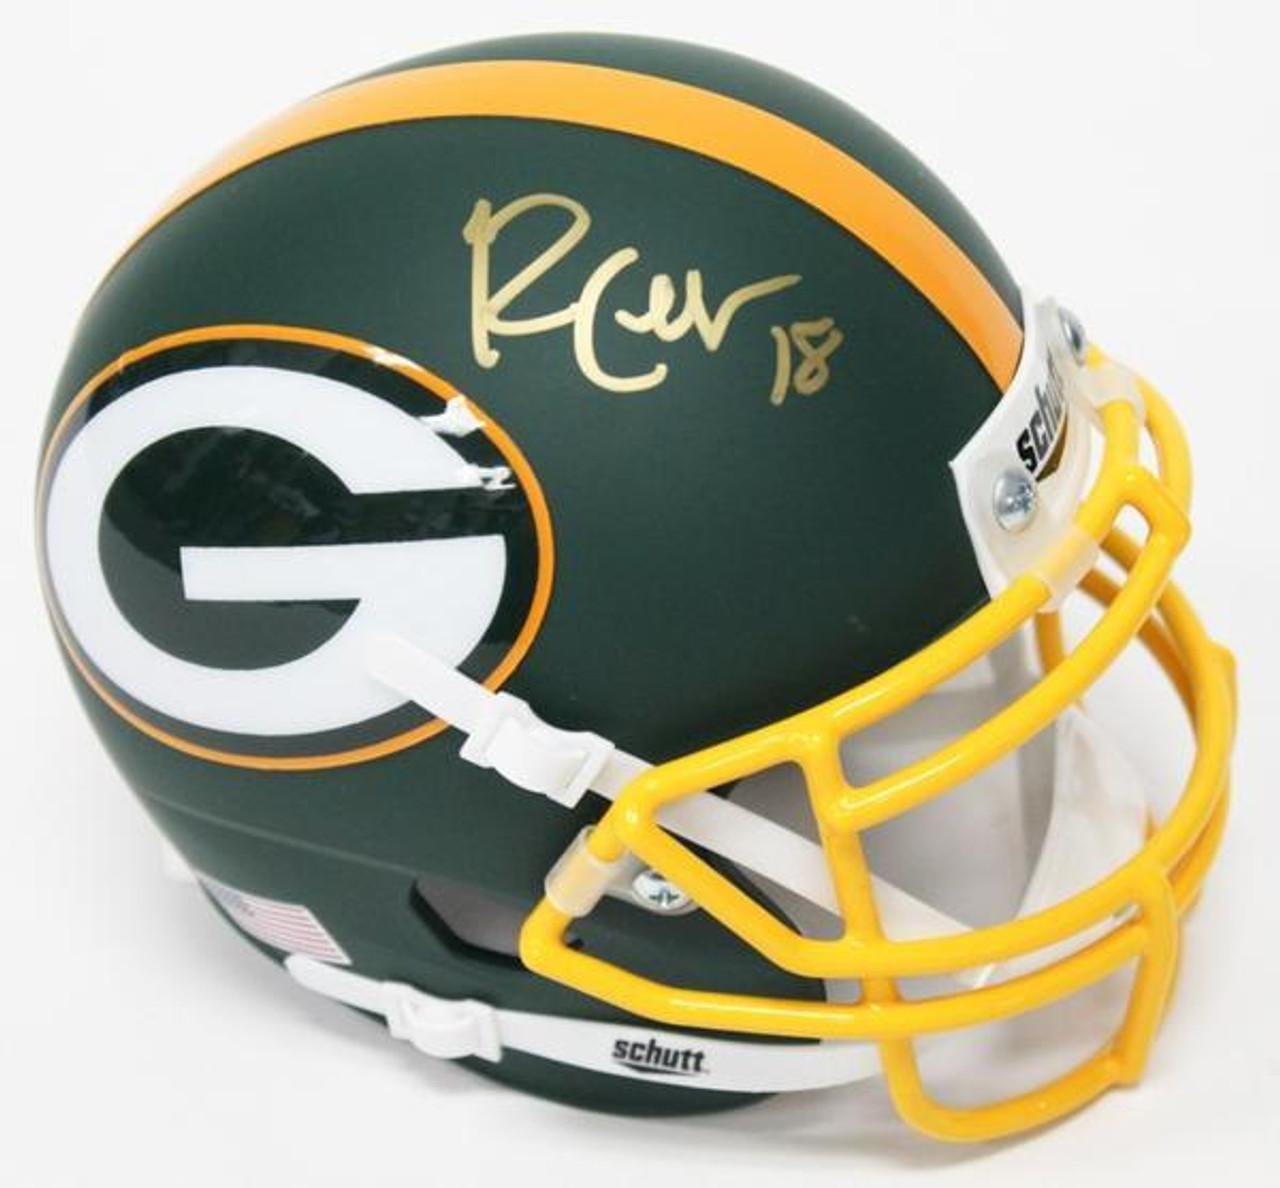 Randall Cobb Green Bay Packers Custom Mini Helmet Maverick Autographs And Collectibles